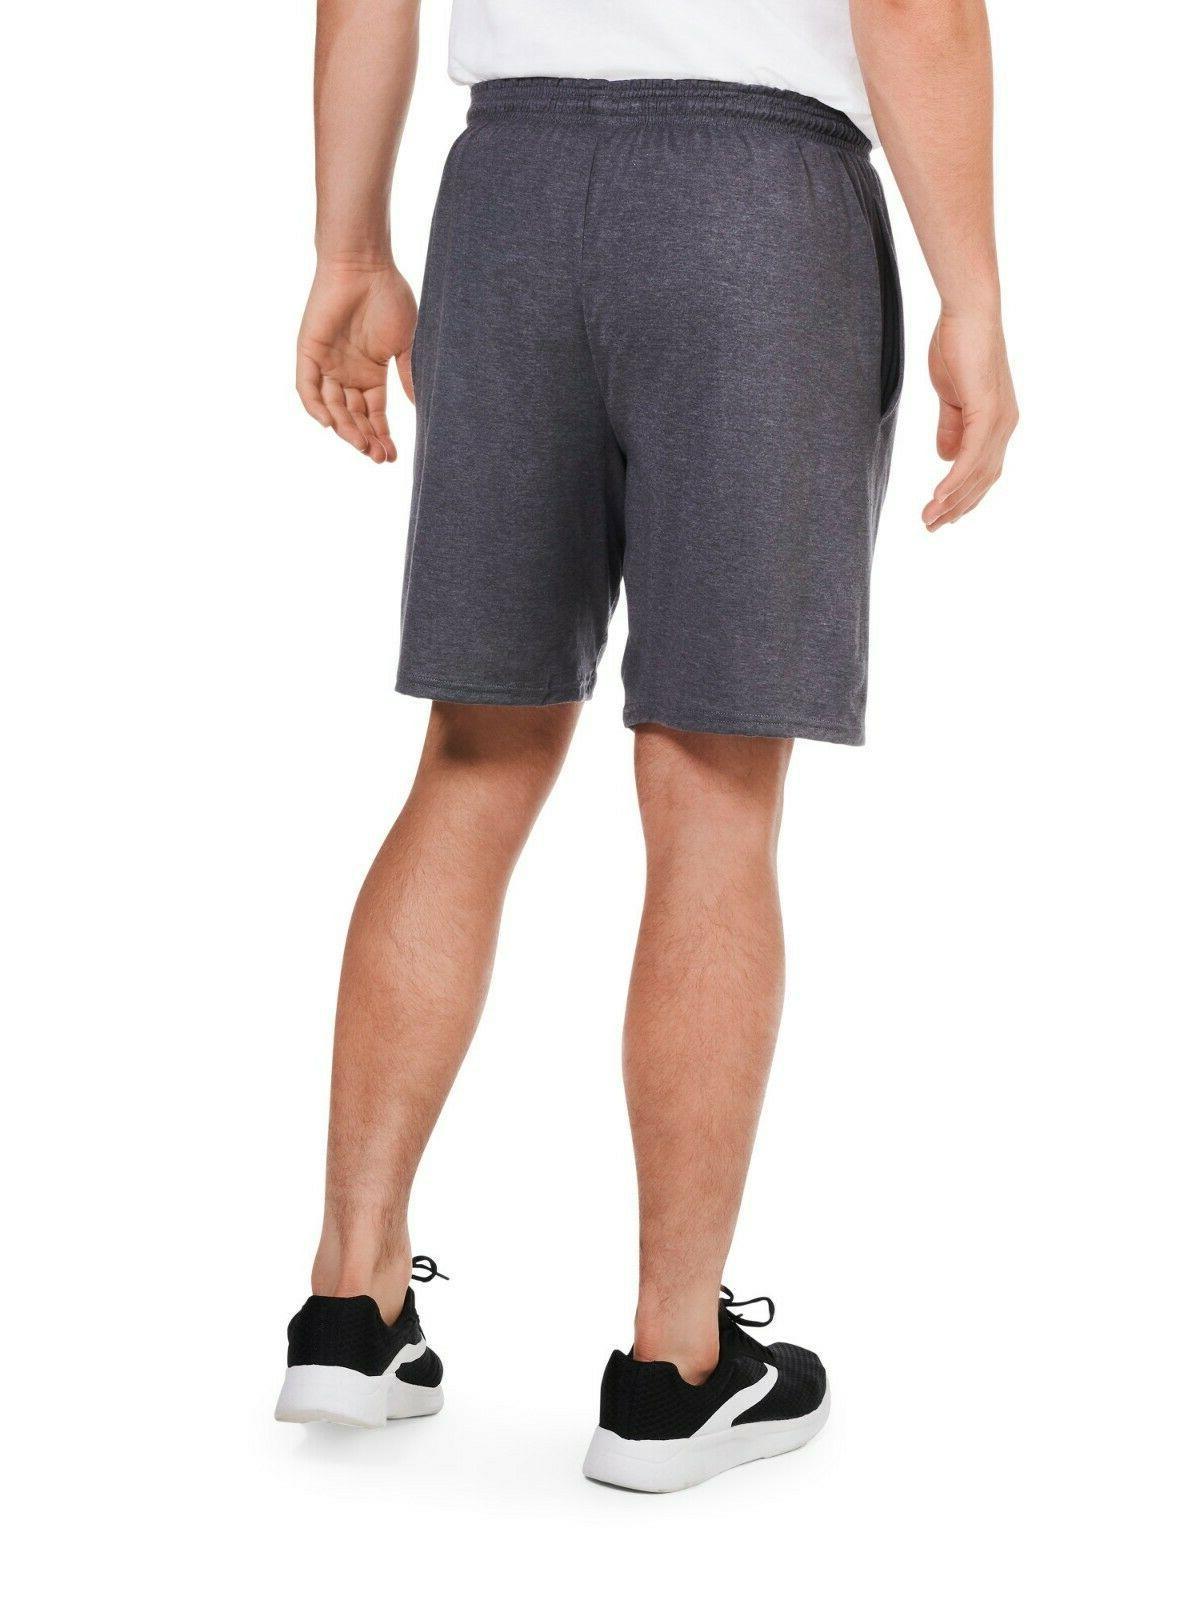 Men Pants Jersey Shorts Side Pockets